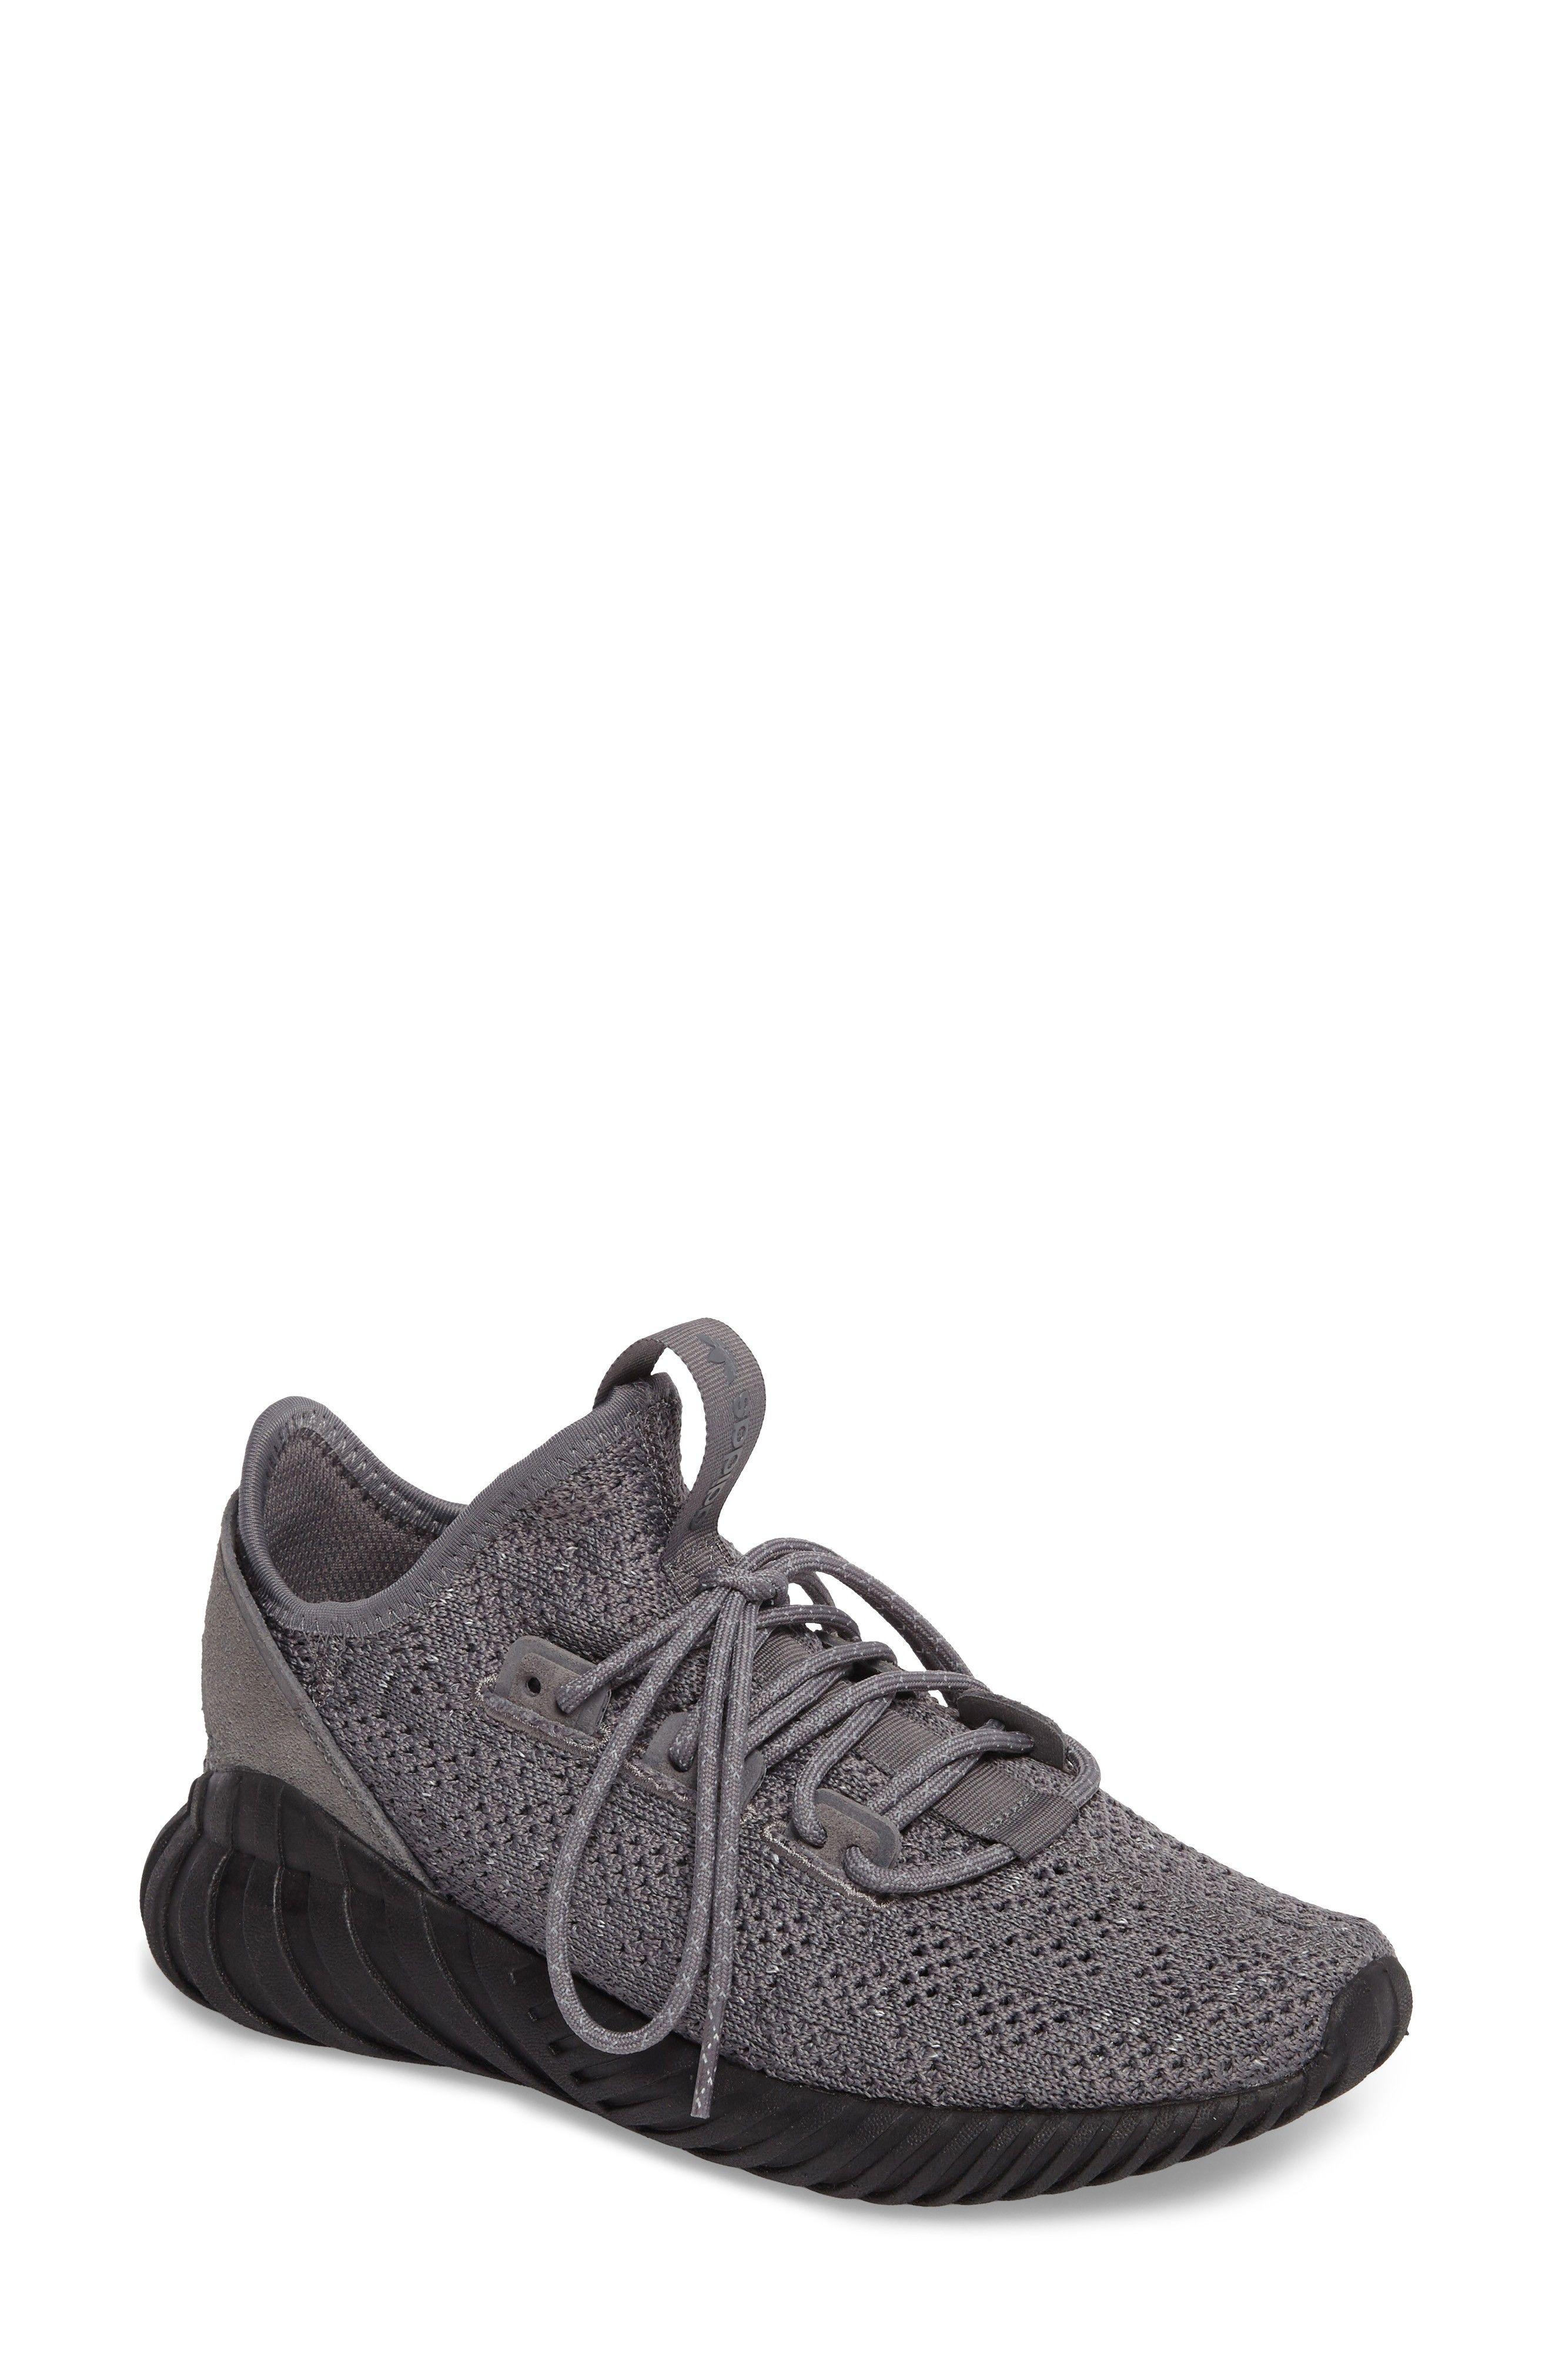 Buy ADIDAS Tubular Doom Sock Primeknit Sneaker online. New ADIDAS Shoes.    119.95  SKU ZSFR39517FFEX51742 d9bd8a7a3